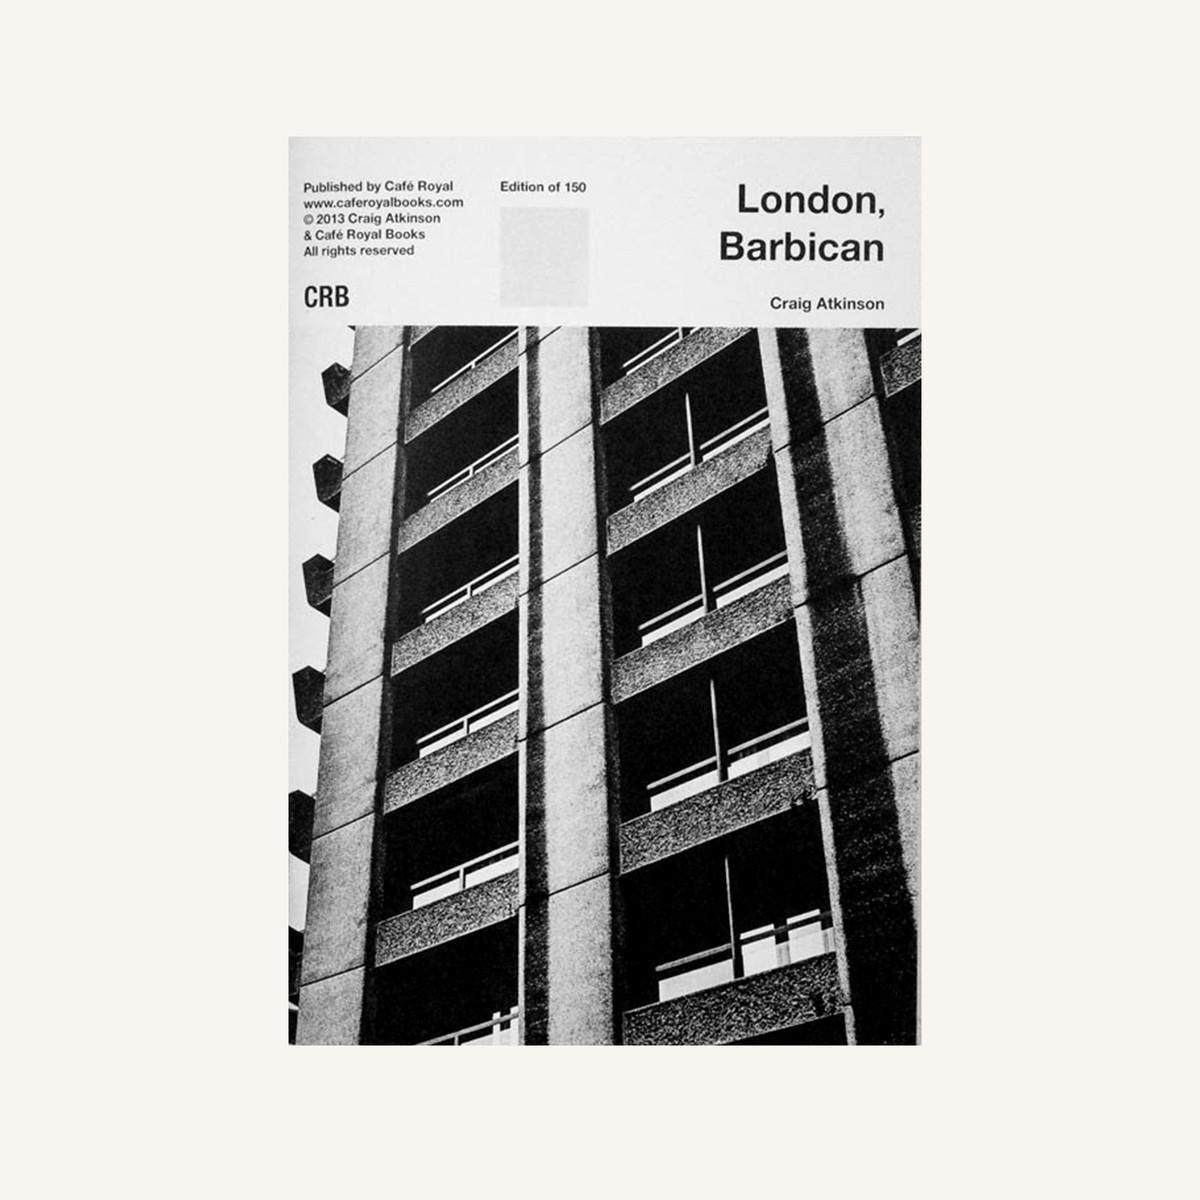 Photo of Barbican Estate Photozine